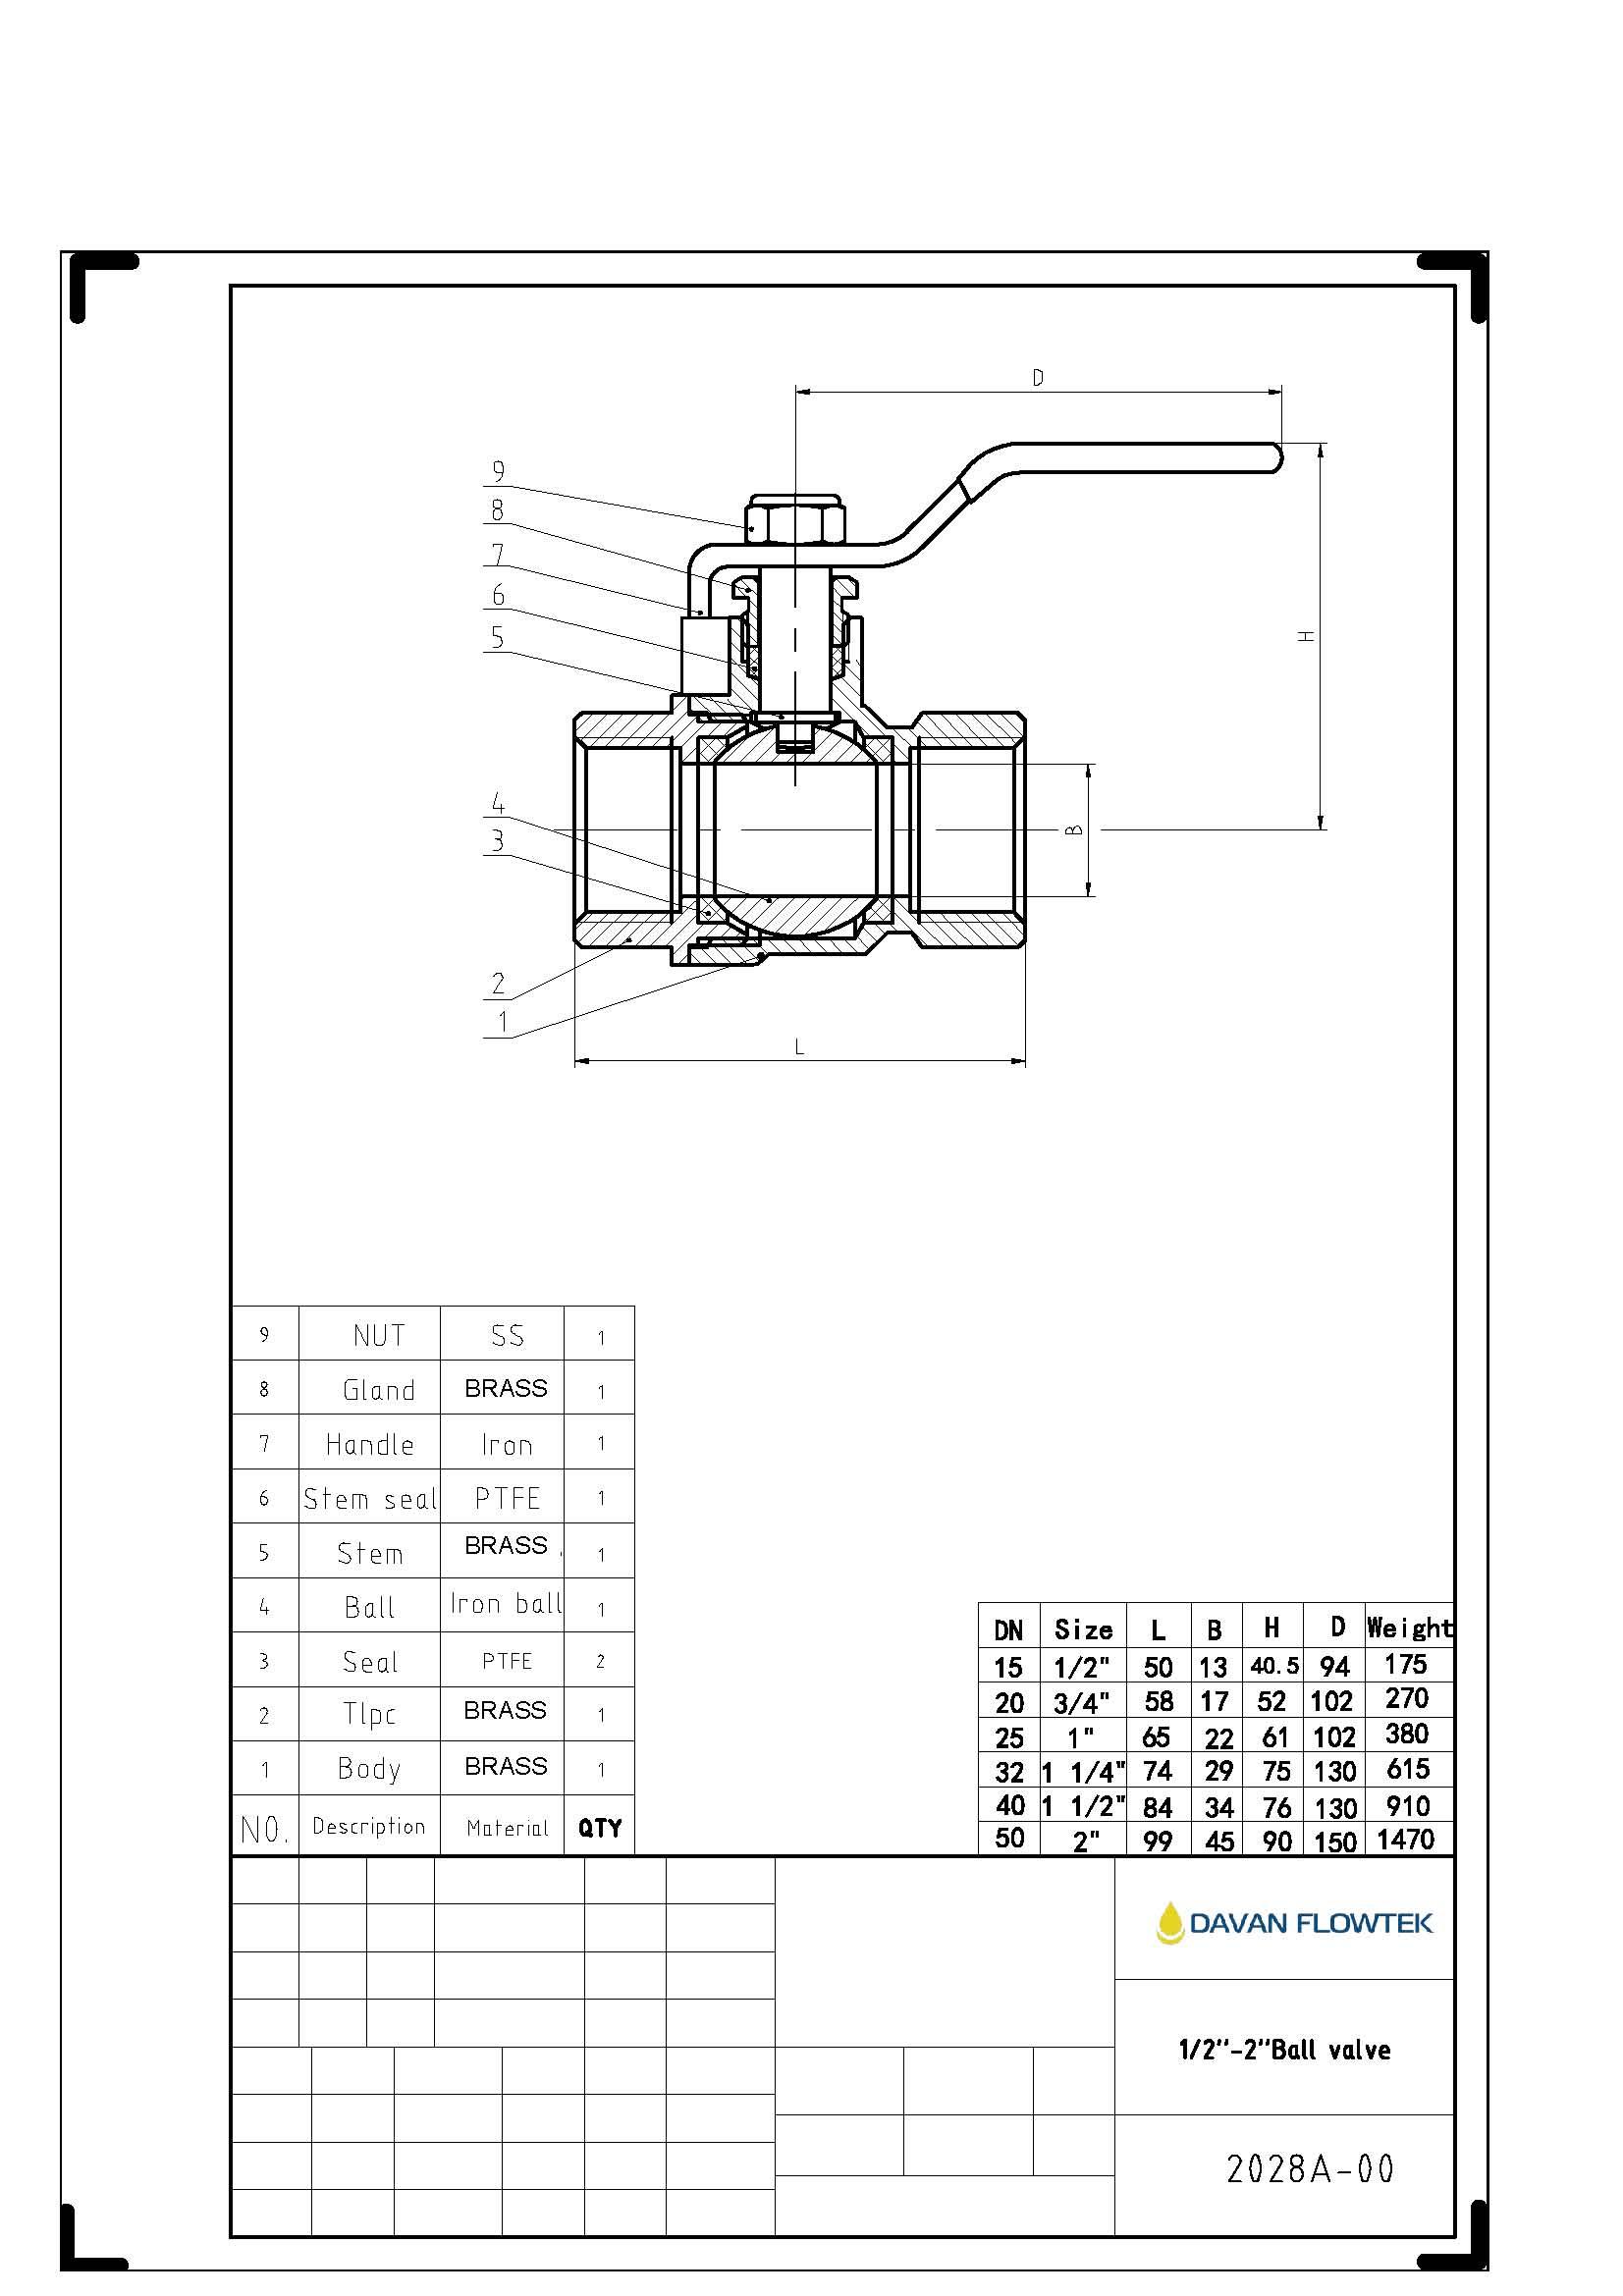 ball valve drawing